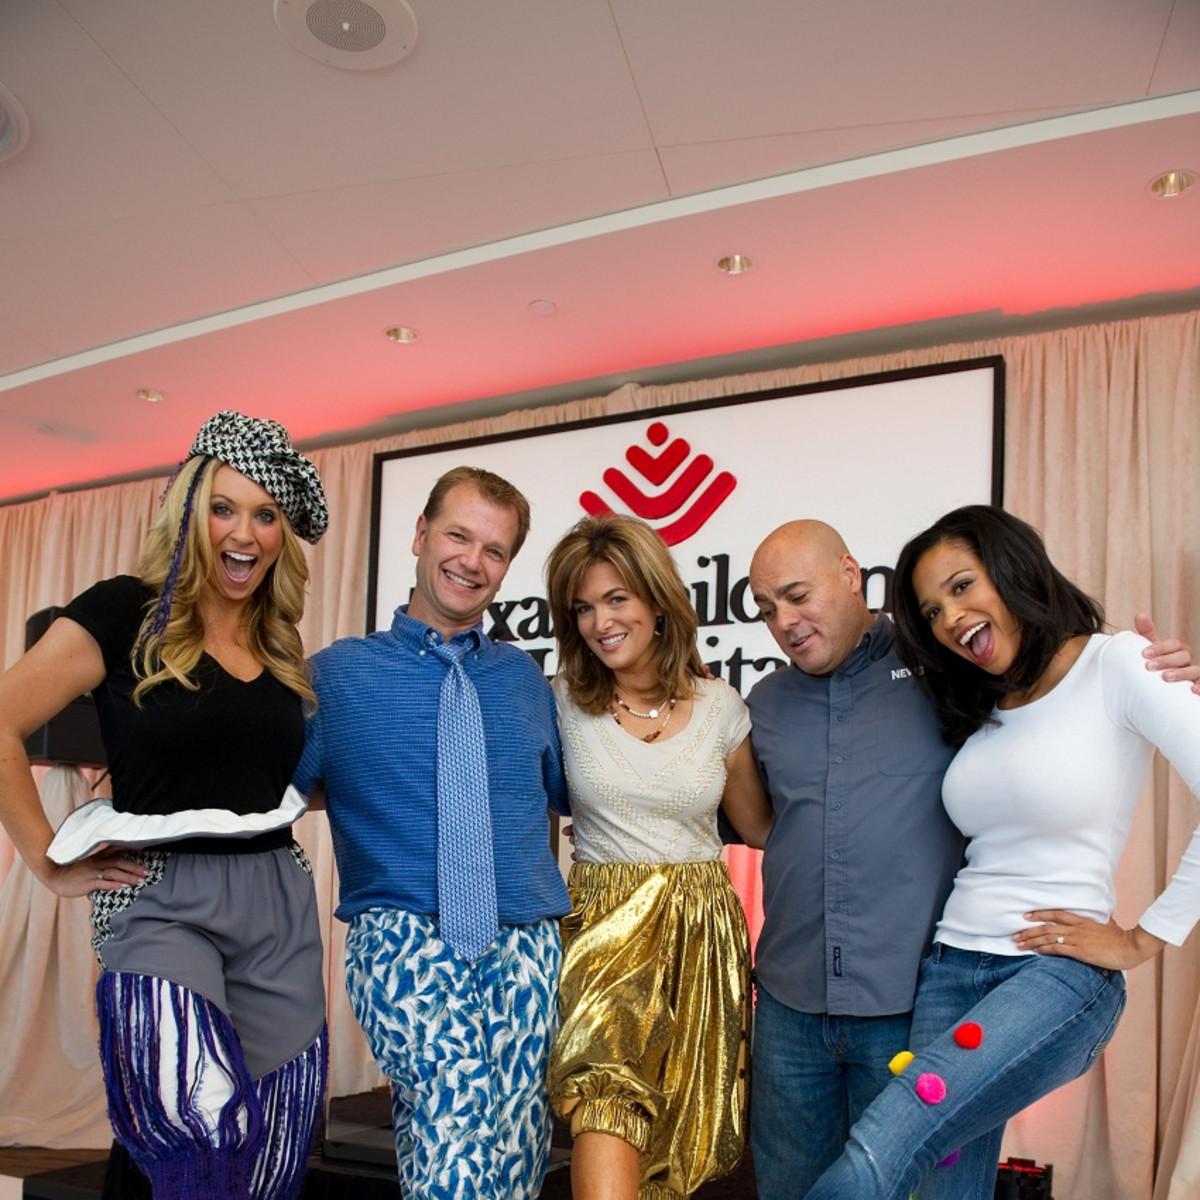 Bad Pants Fashion Show, Chita Johnson, Ned Hibberd, Jorge Vargas, Melissa Wilson, Mia Gradney, Texas Children's Hospital, 2012